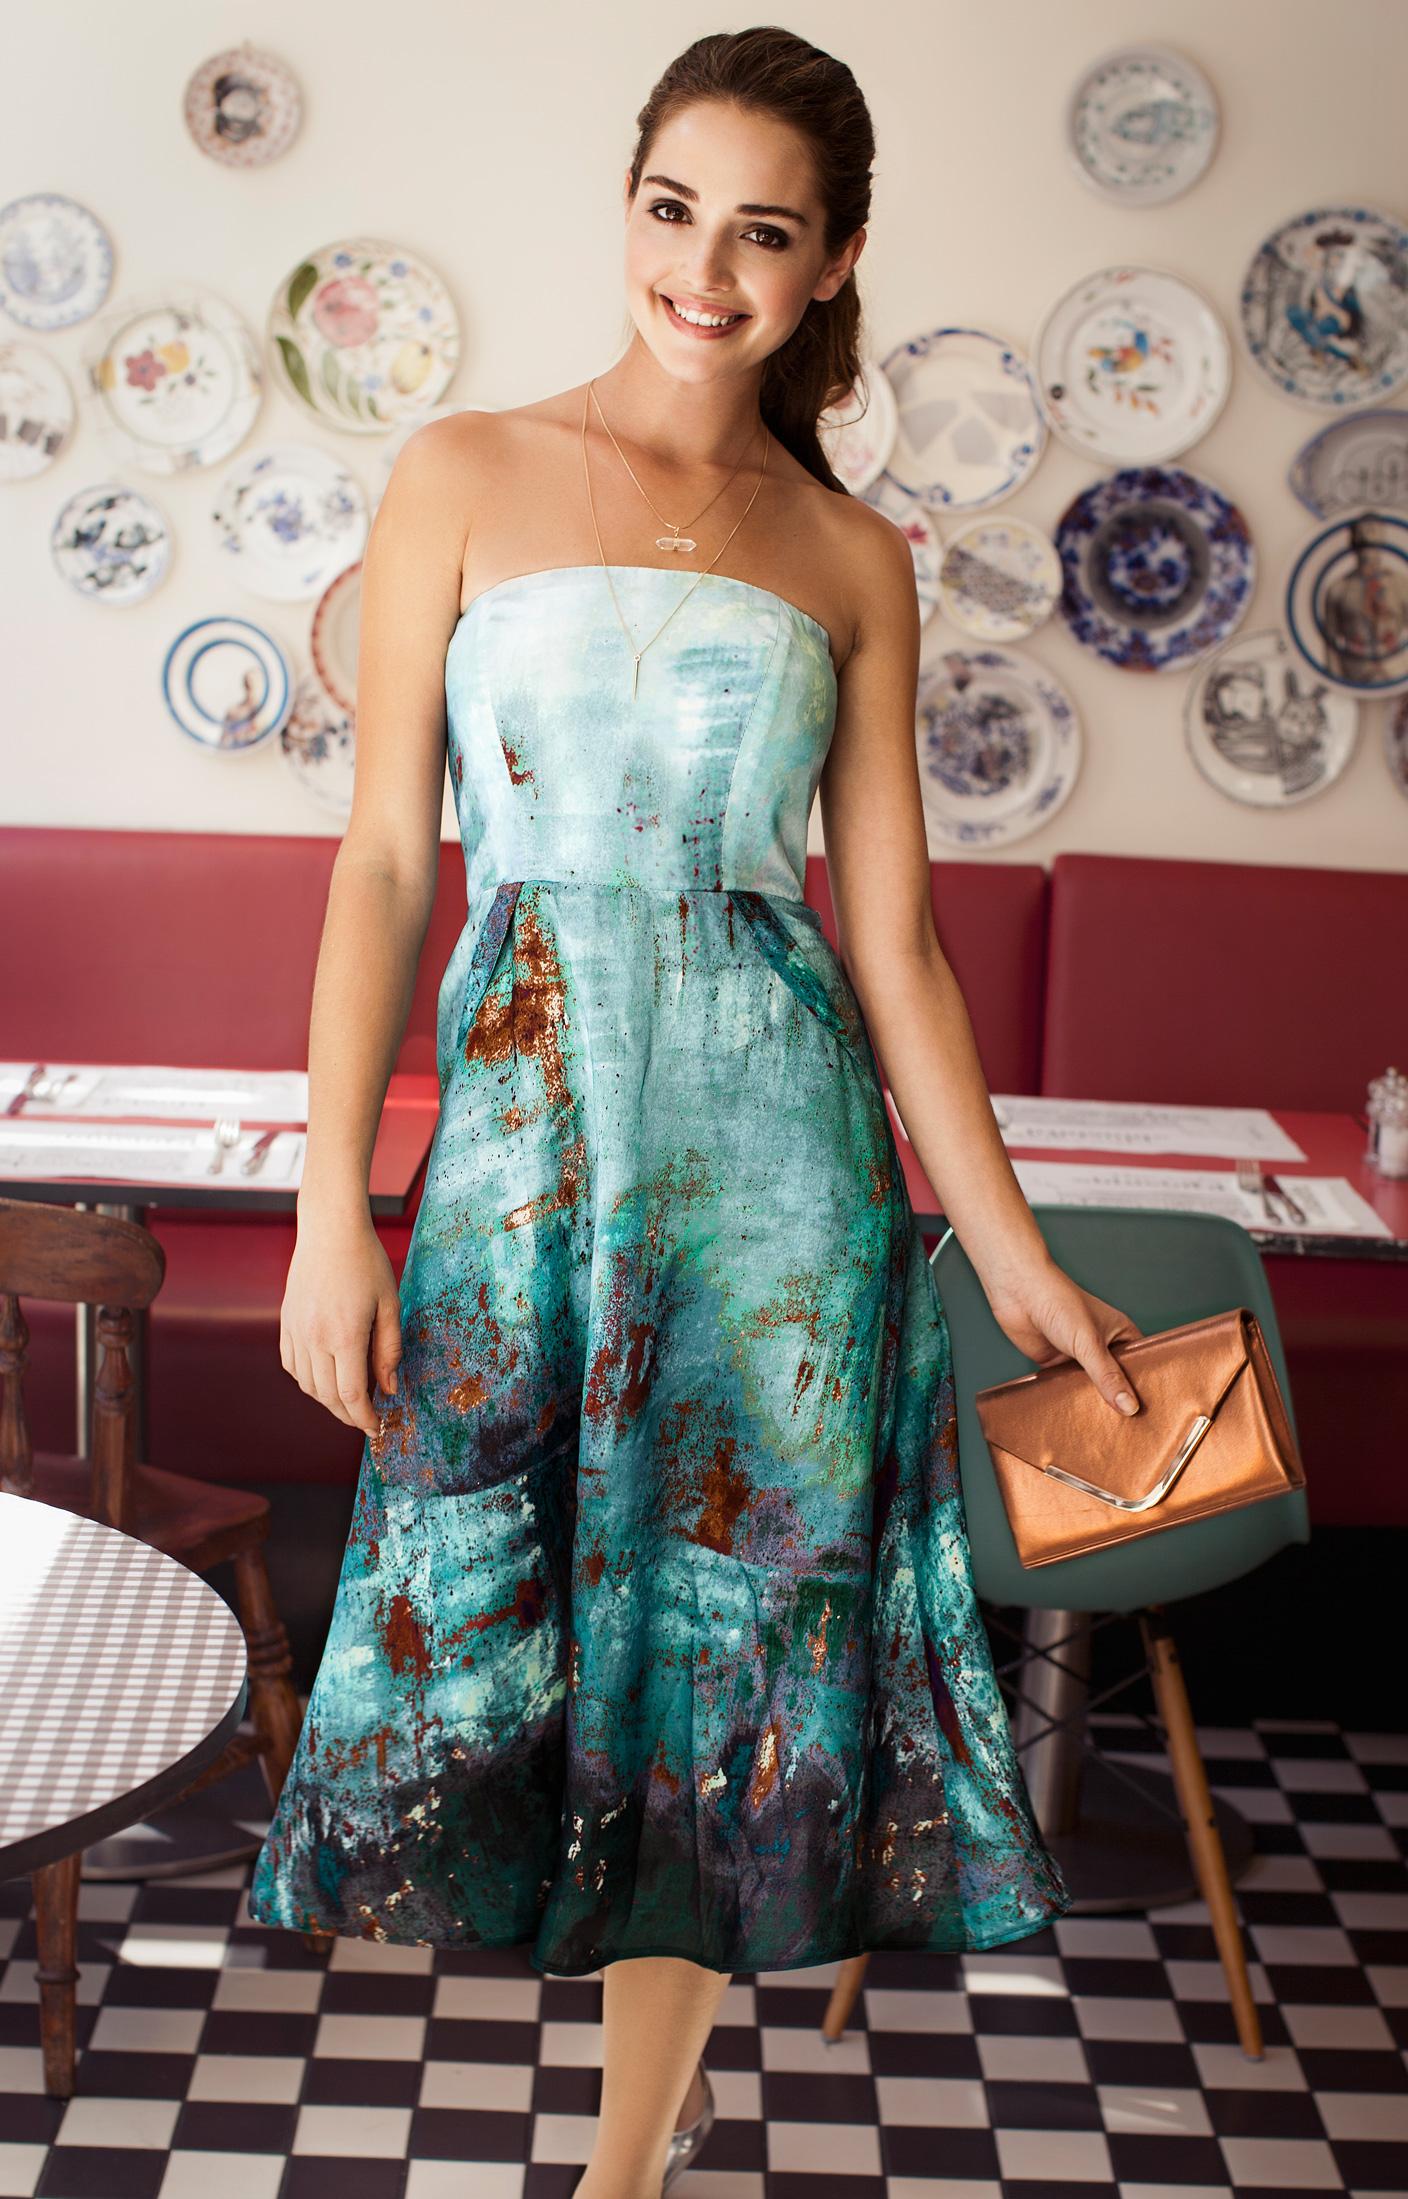 ae720861ddf Alissa Midi Occasion Gown Aquatic Ombre - Evening Dresses